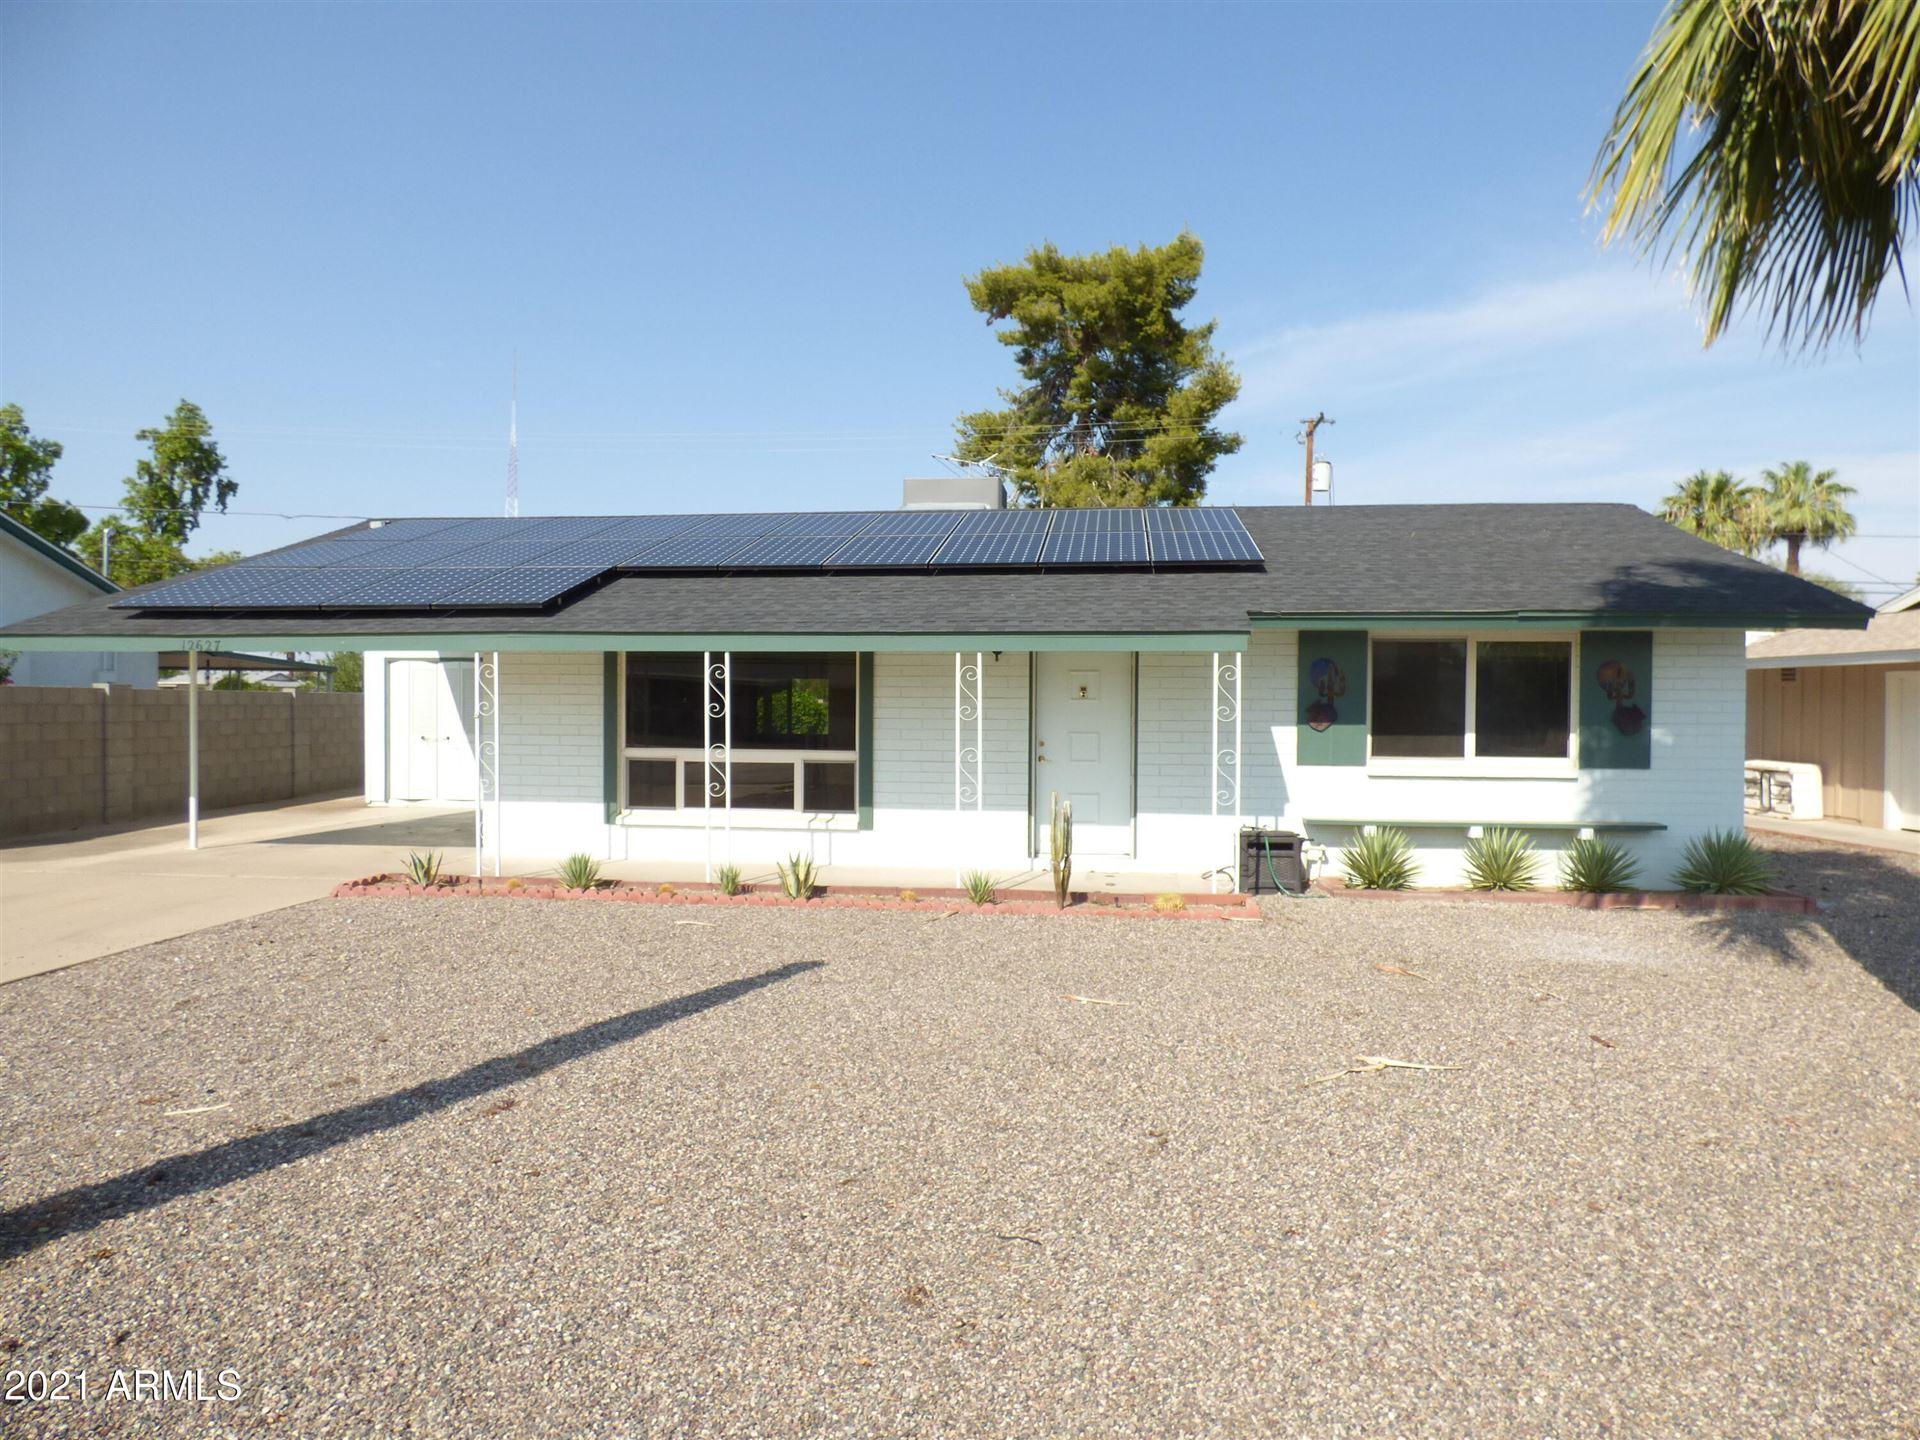 Photo of 12627 N AUGUSTA Drive, Sun City, AZ 85351 (MLS # 6269405)